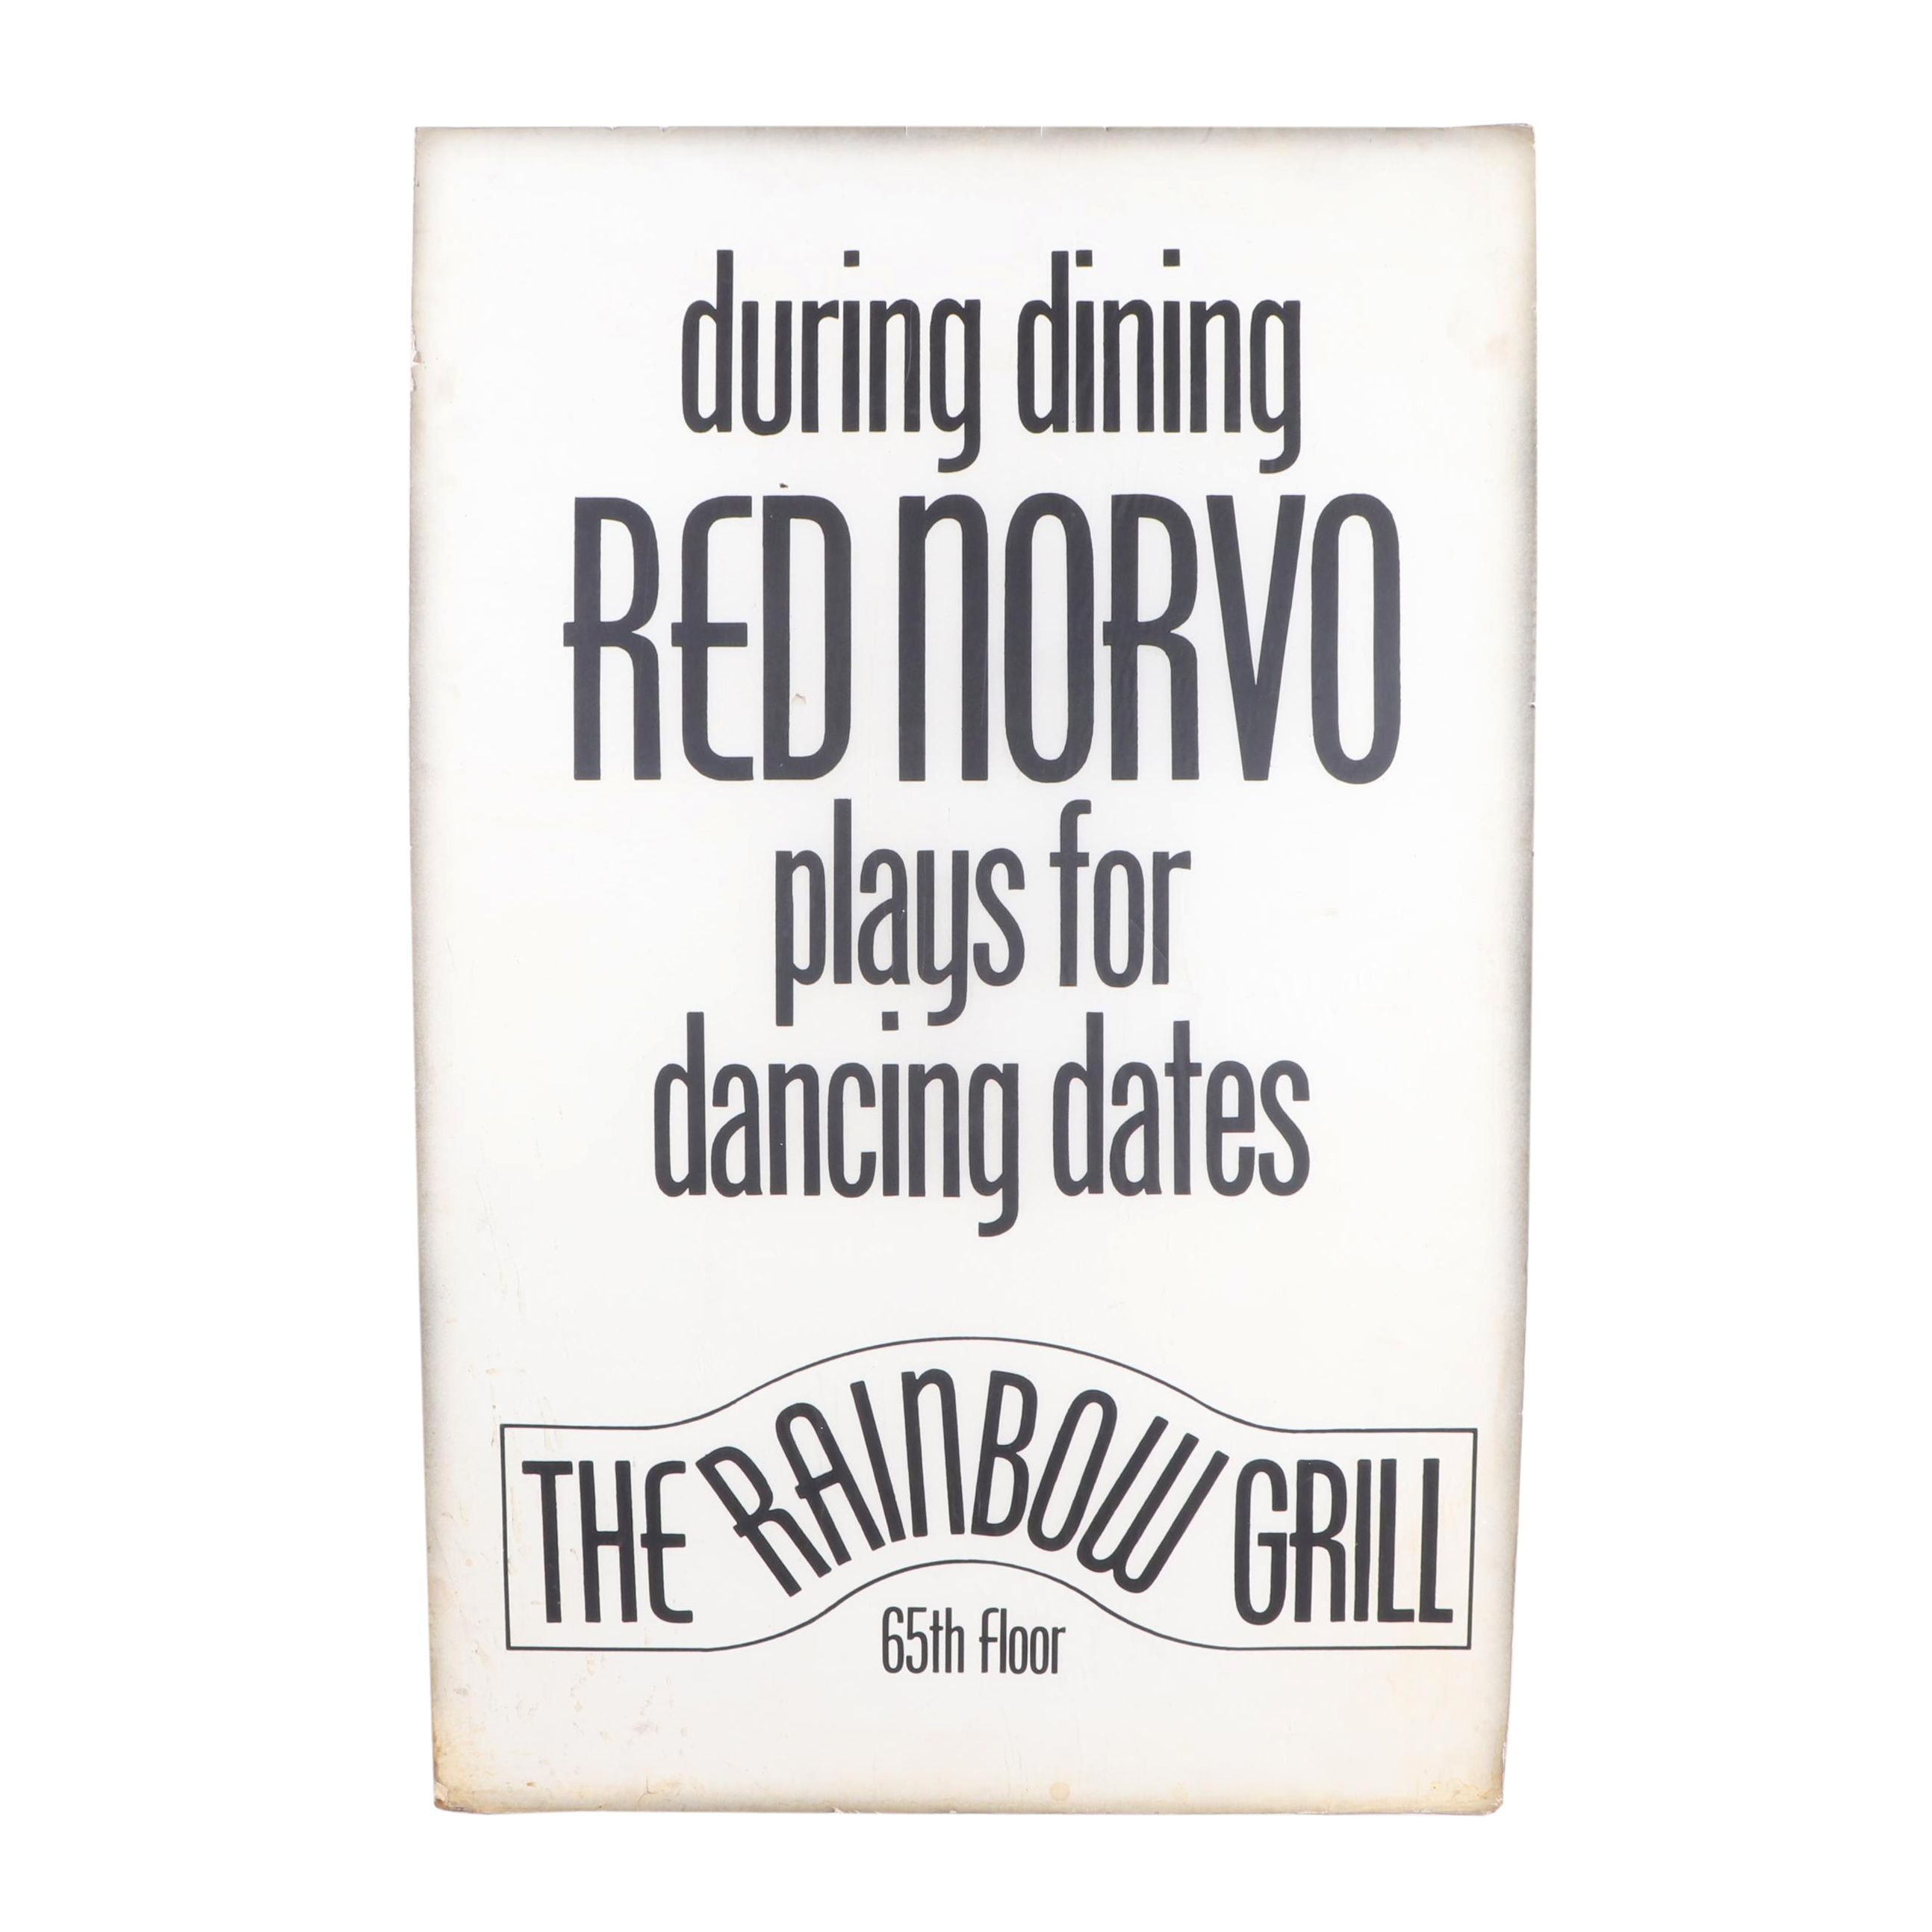 Red Norvo Rainbow Grill Concert Poster, 1960s, Jack Bradley Estate